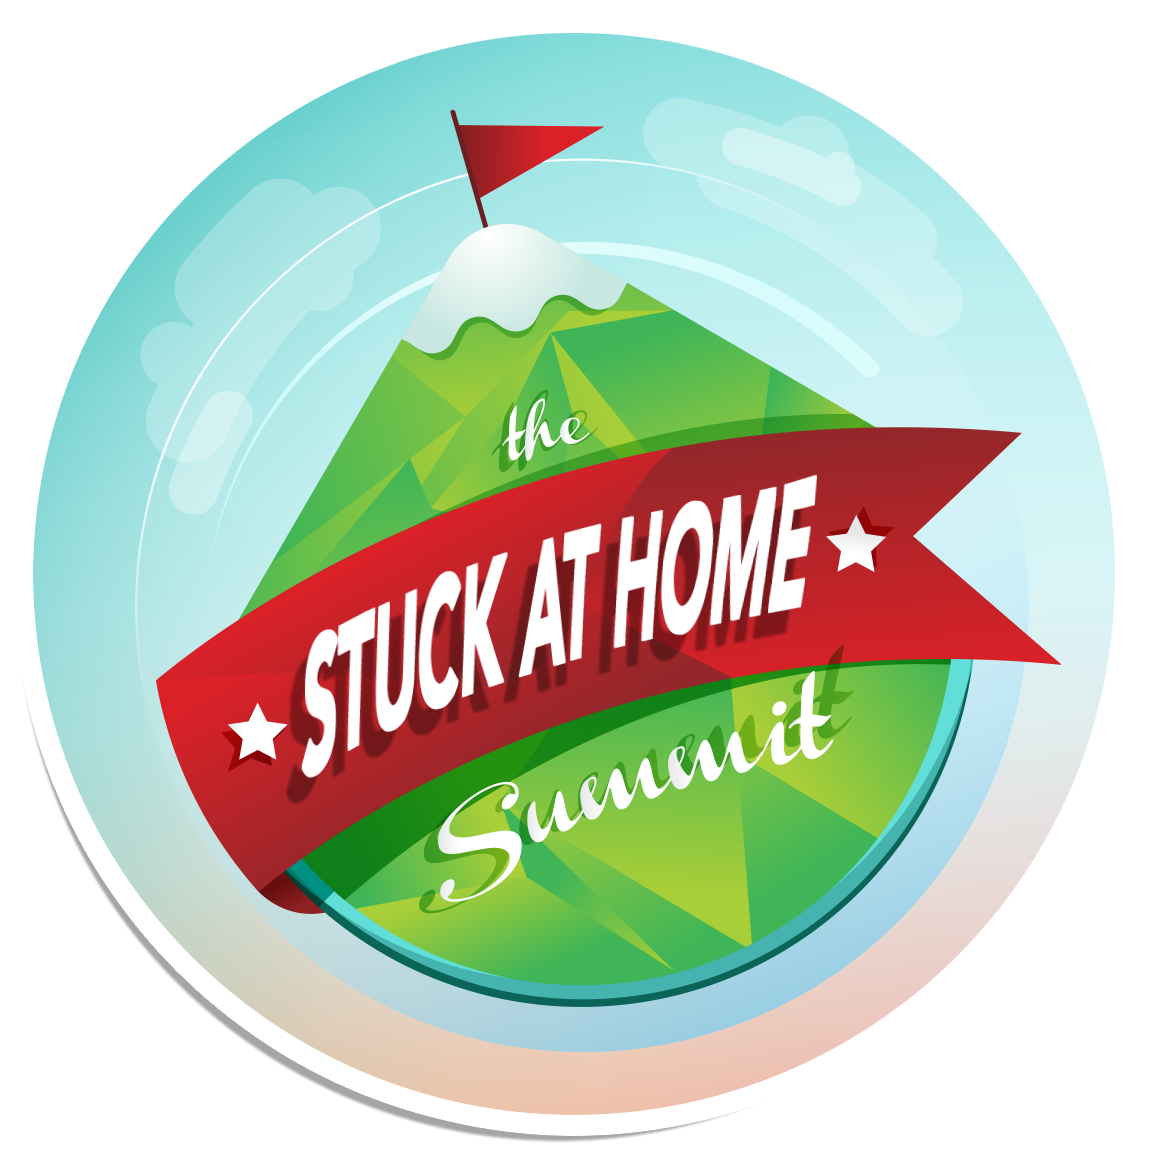 Stuck At Home Summit